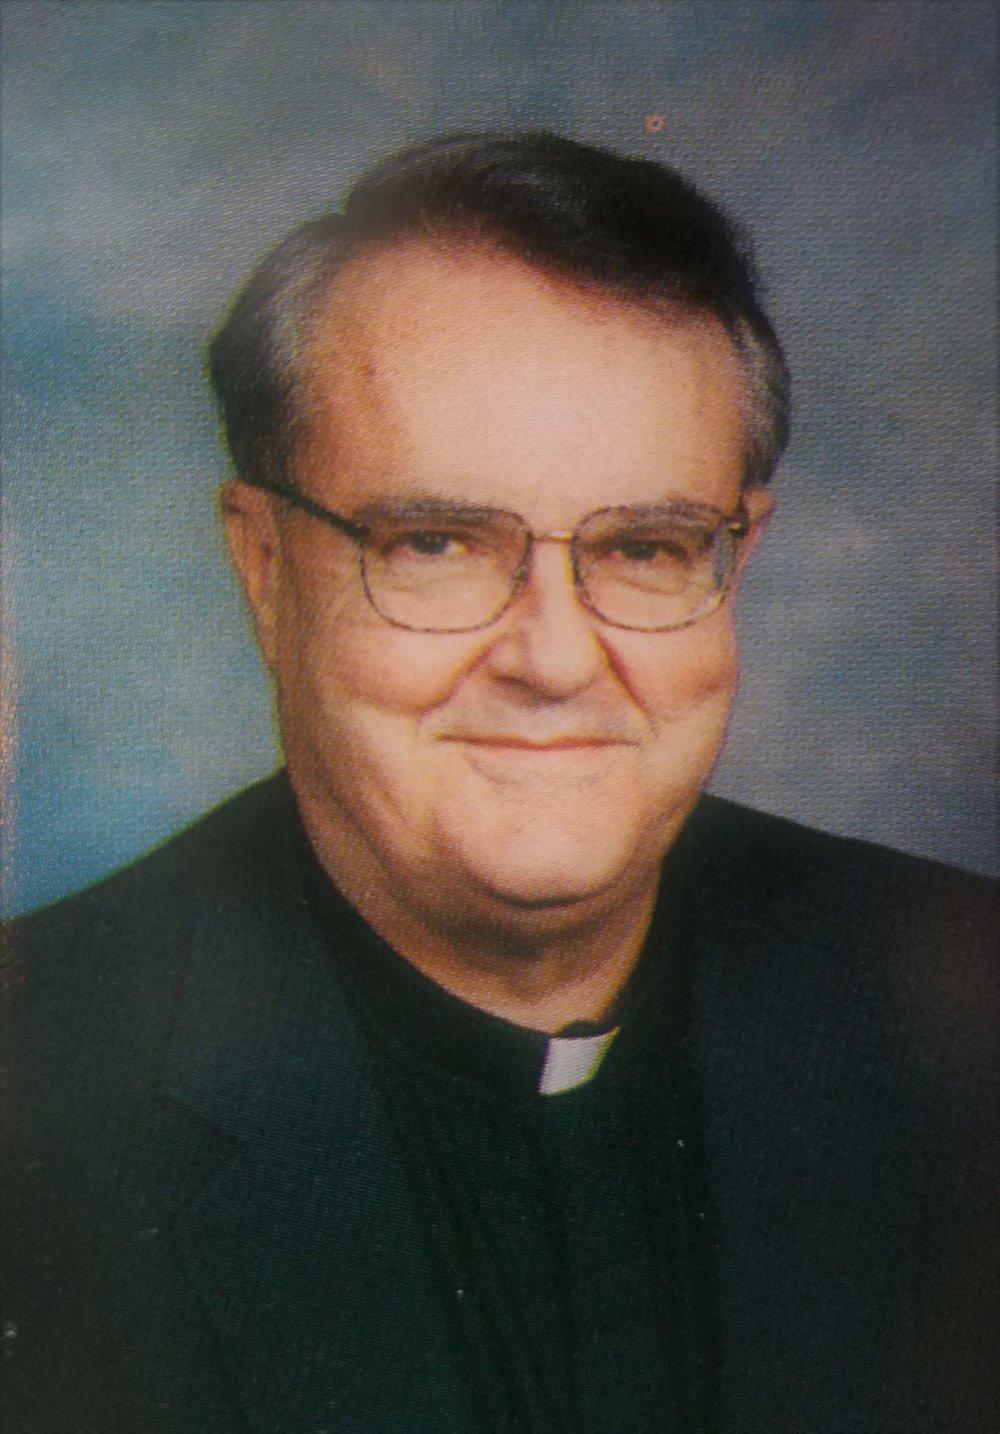 Father Patrick Clark